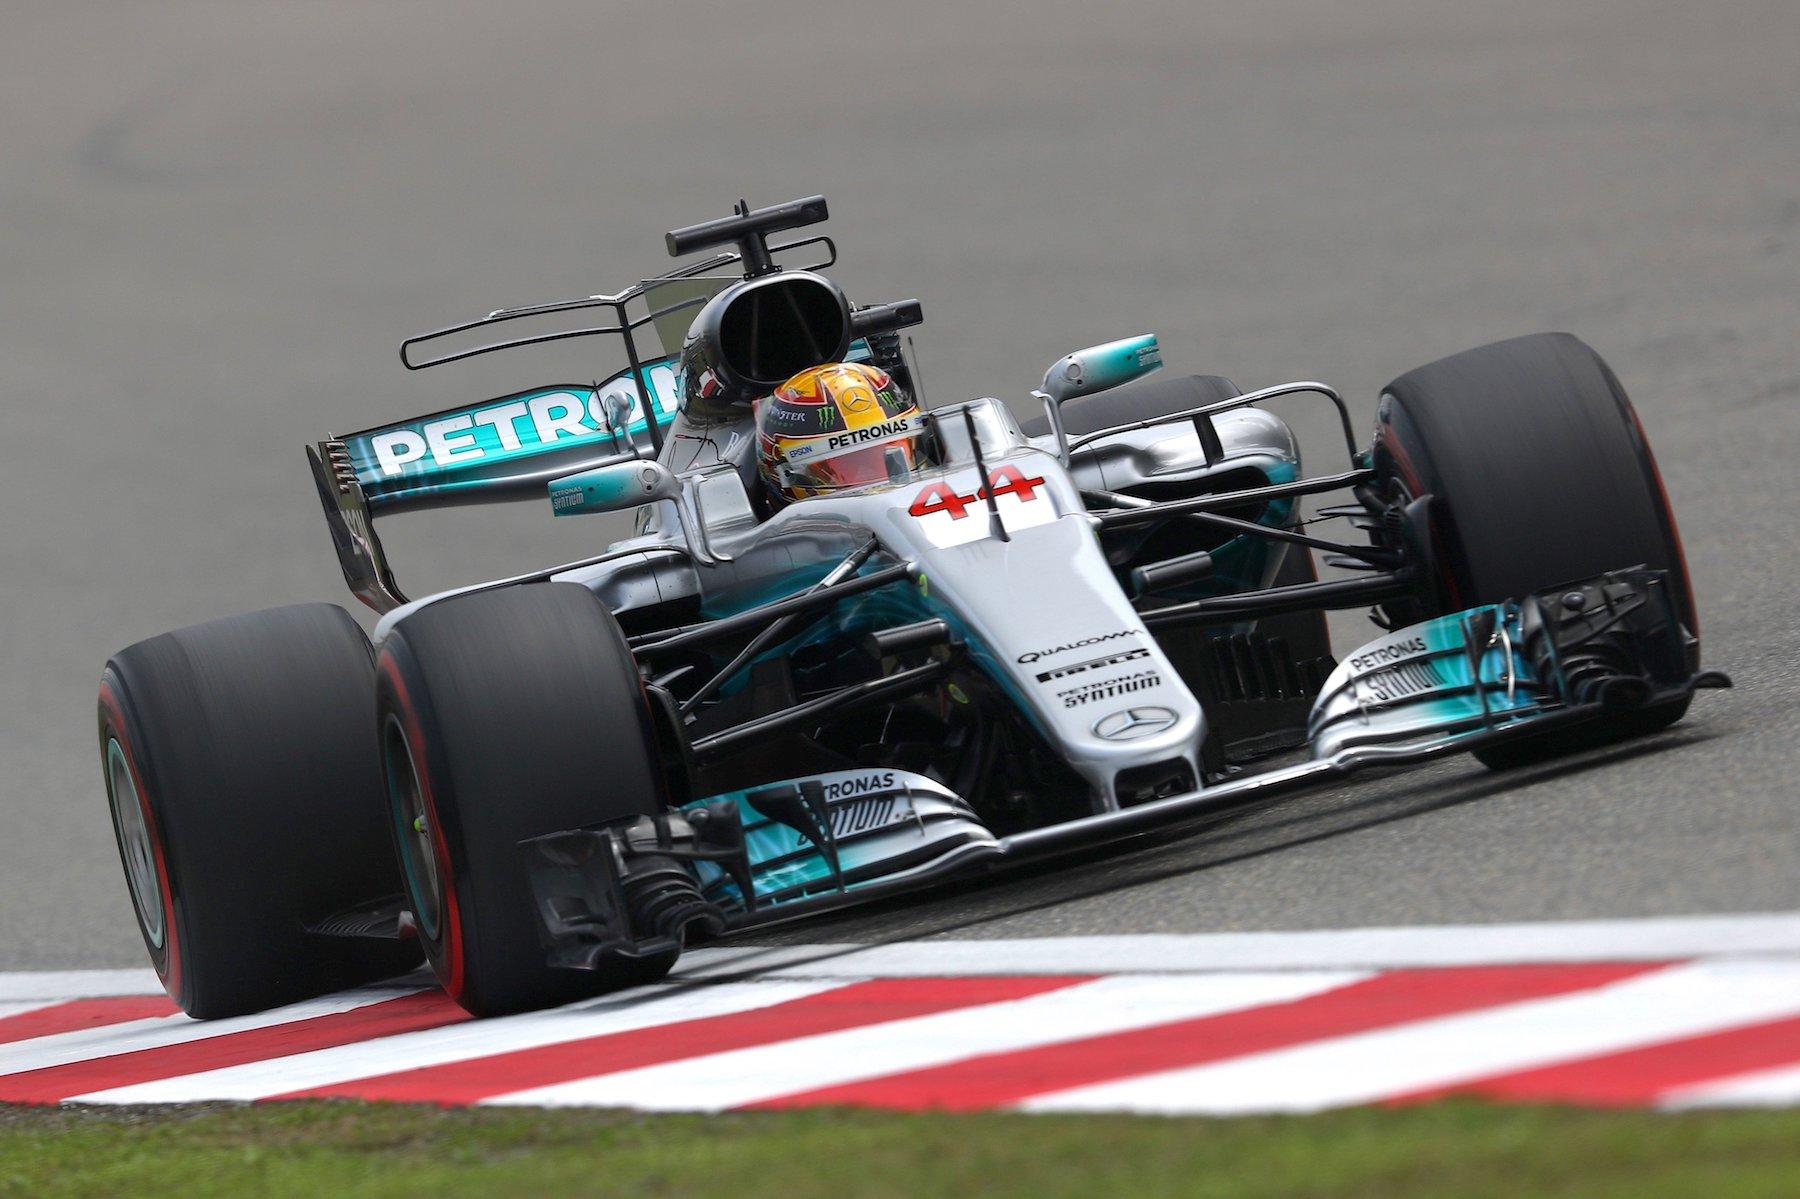 2017 Lewis Hamilton | Mercedes W08 | 2017 Chinese GP Pole 2 copy.jpg